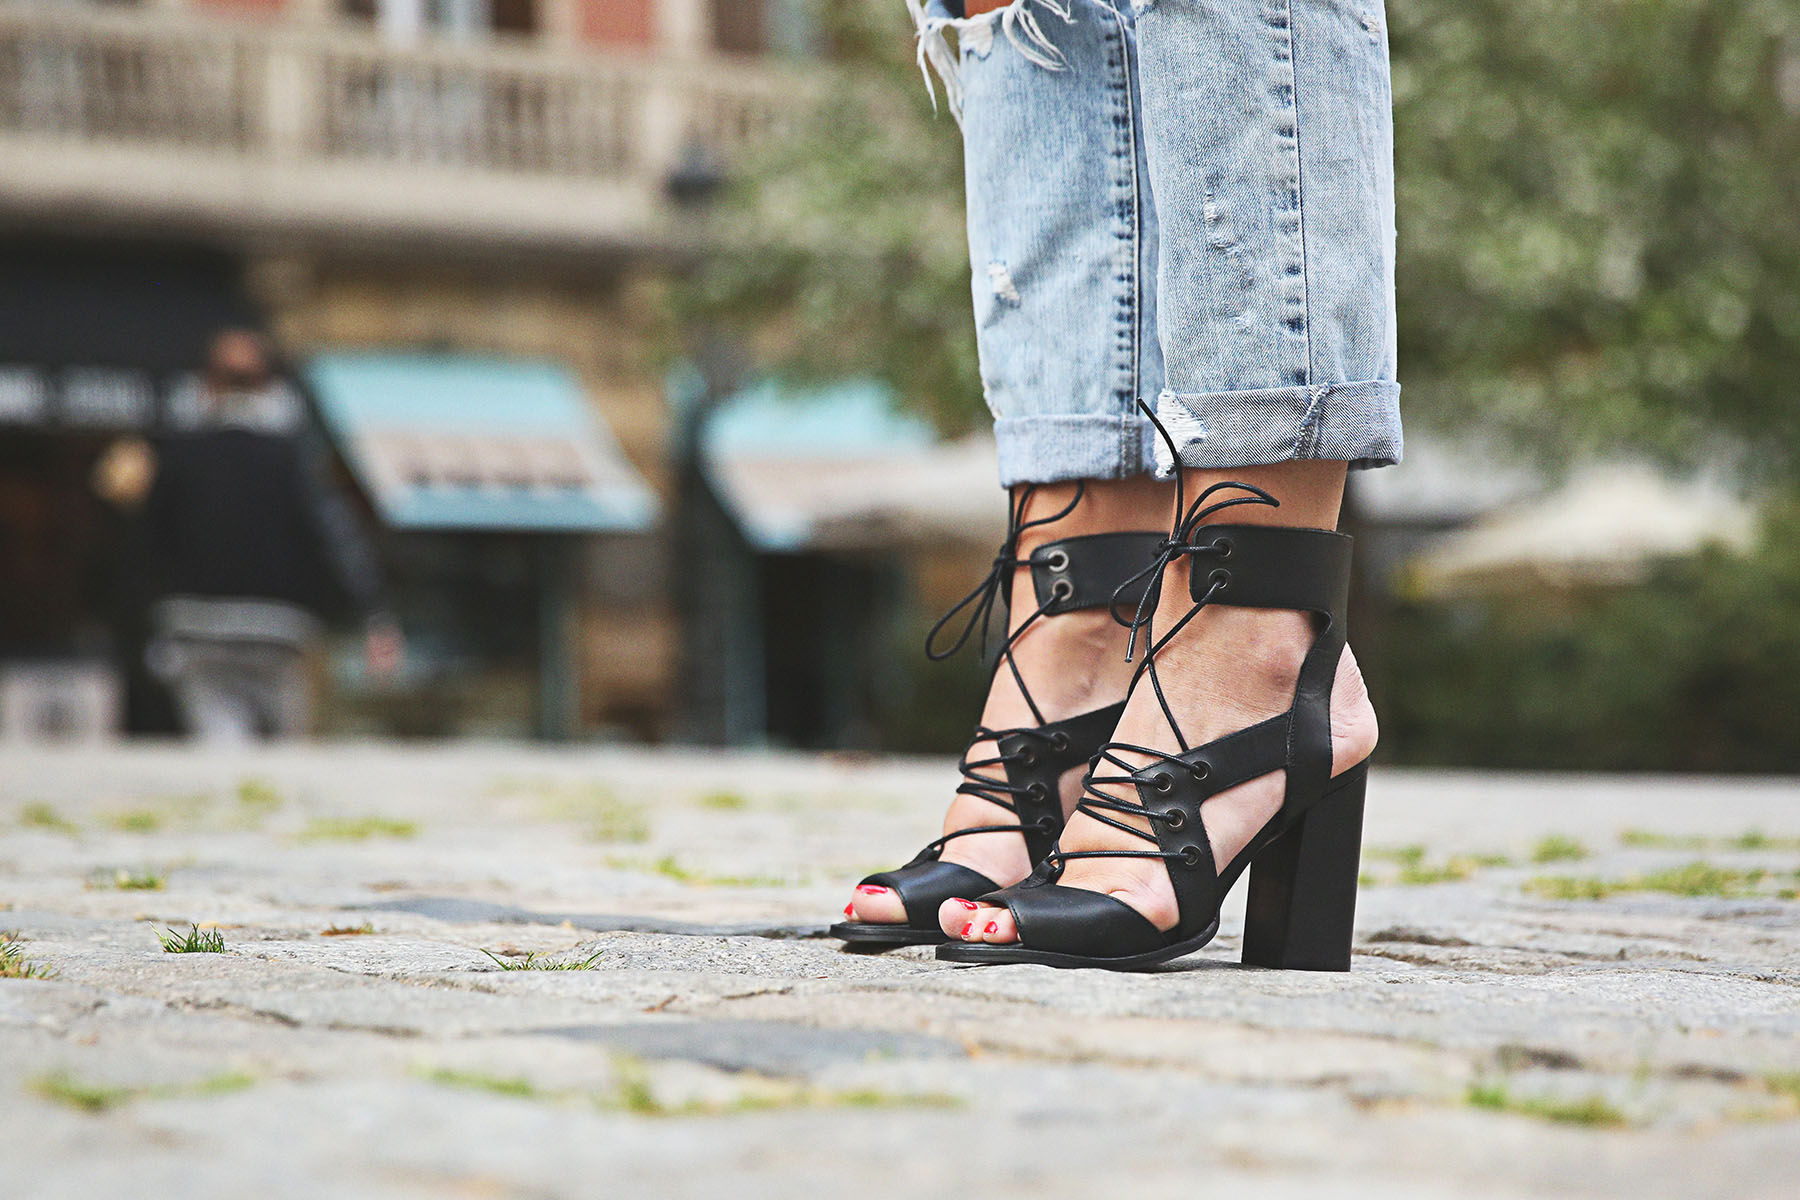 trendy-taste-look-outfit-street-style-ootd-blog-blogger-fashion-spain-moda-españa-boyfriend-vaqueros-jeans-steve-madden-sandalias-verano-primavera-leather-jacket-chaqueta-cuero-khaki-caqui-ripped-rotos-11